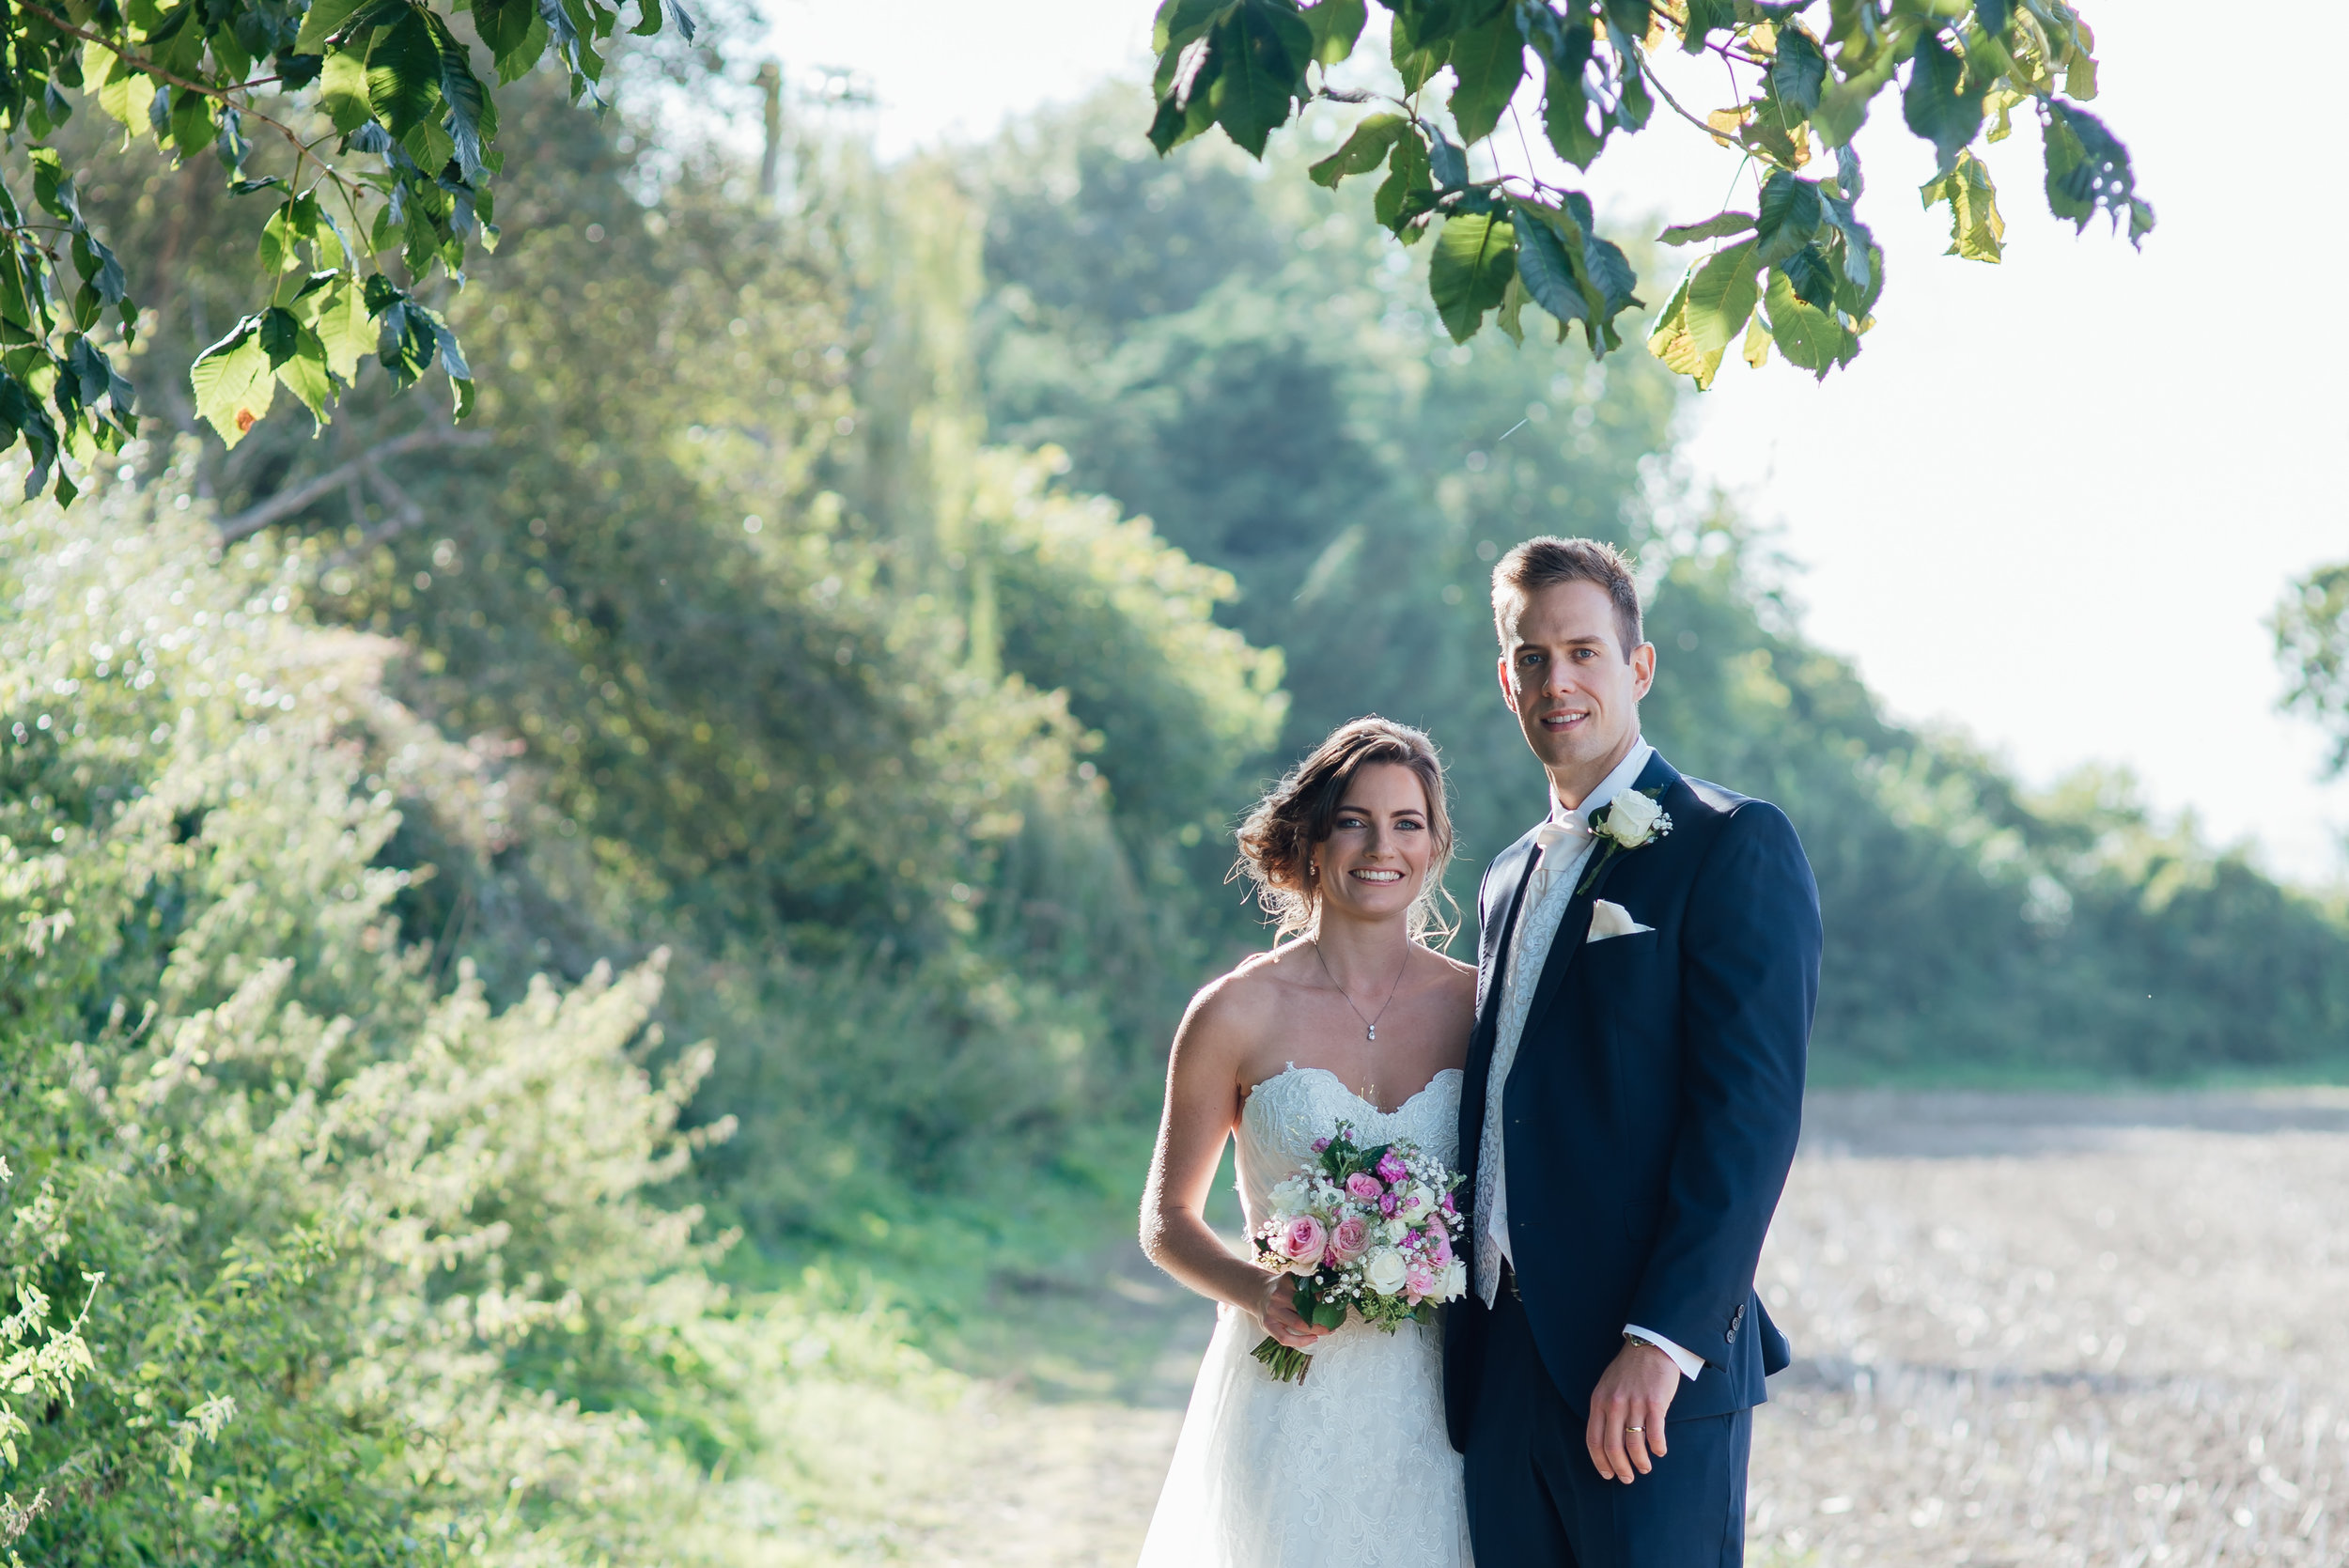 Hampshire-wedding-photographer / Hampshire-village-hall-wedding / Amy-james-photography / rotherwick-village-hall-wedding / wedding-photographer-hampshire